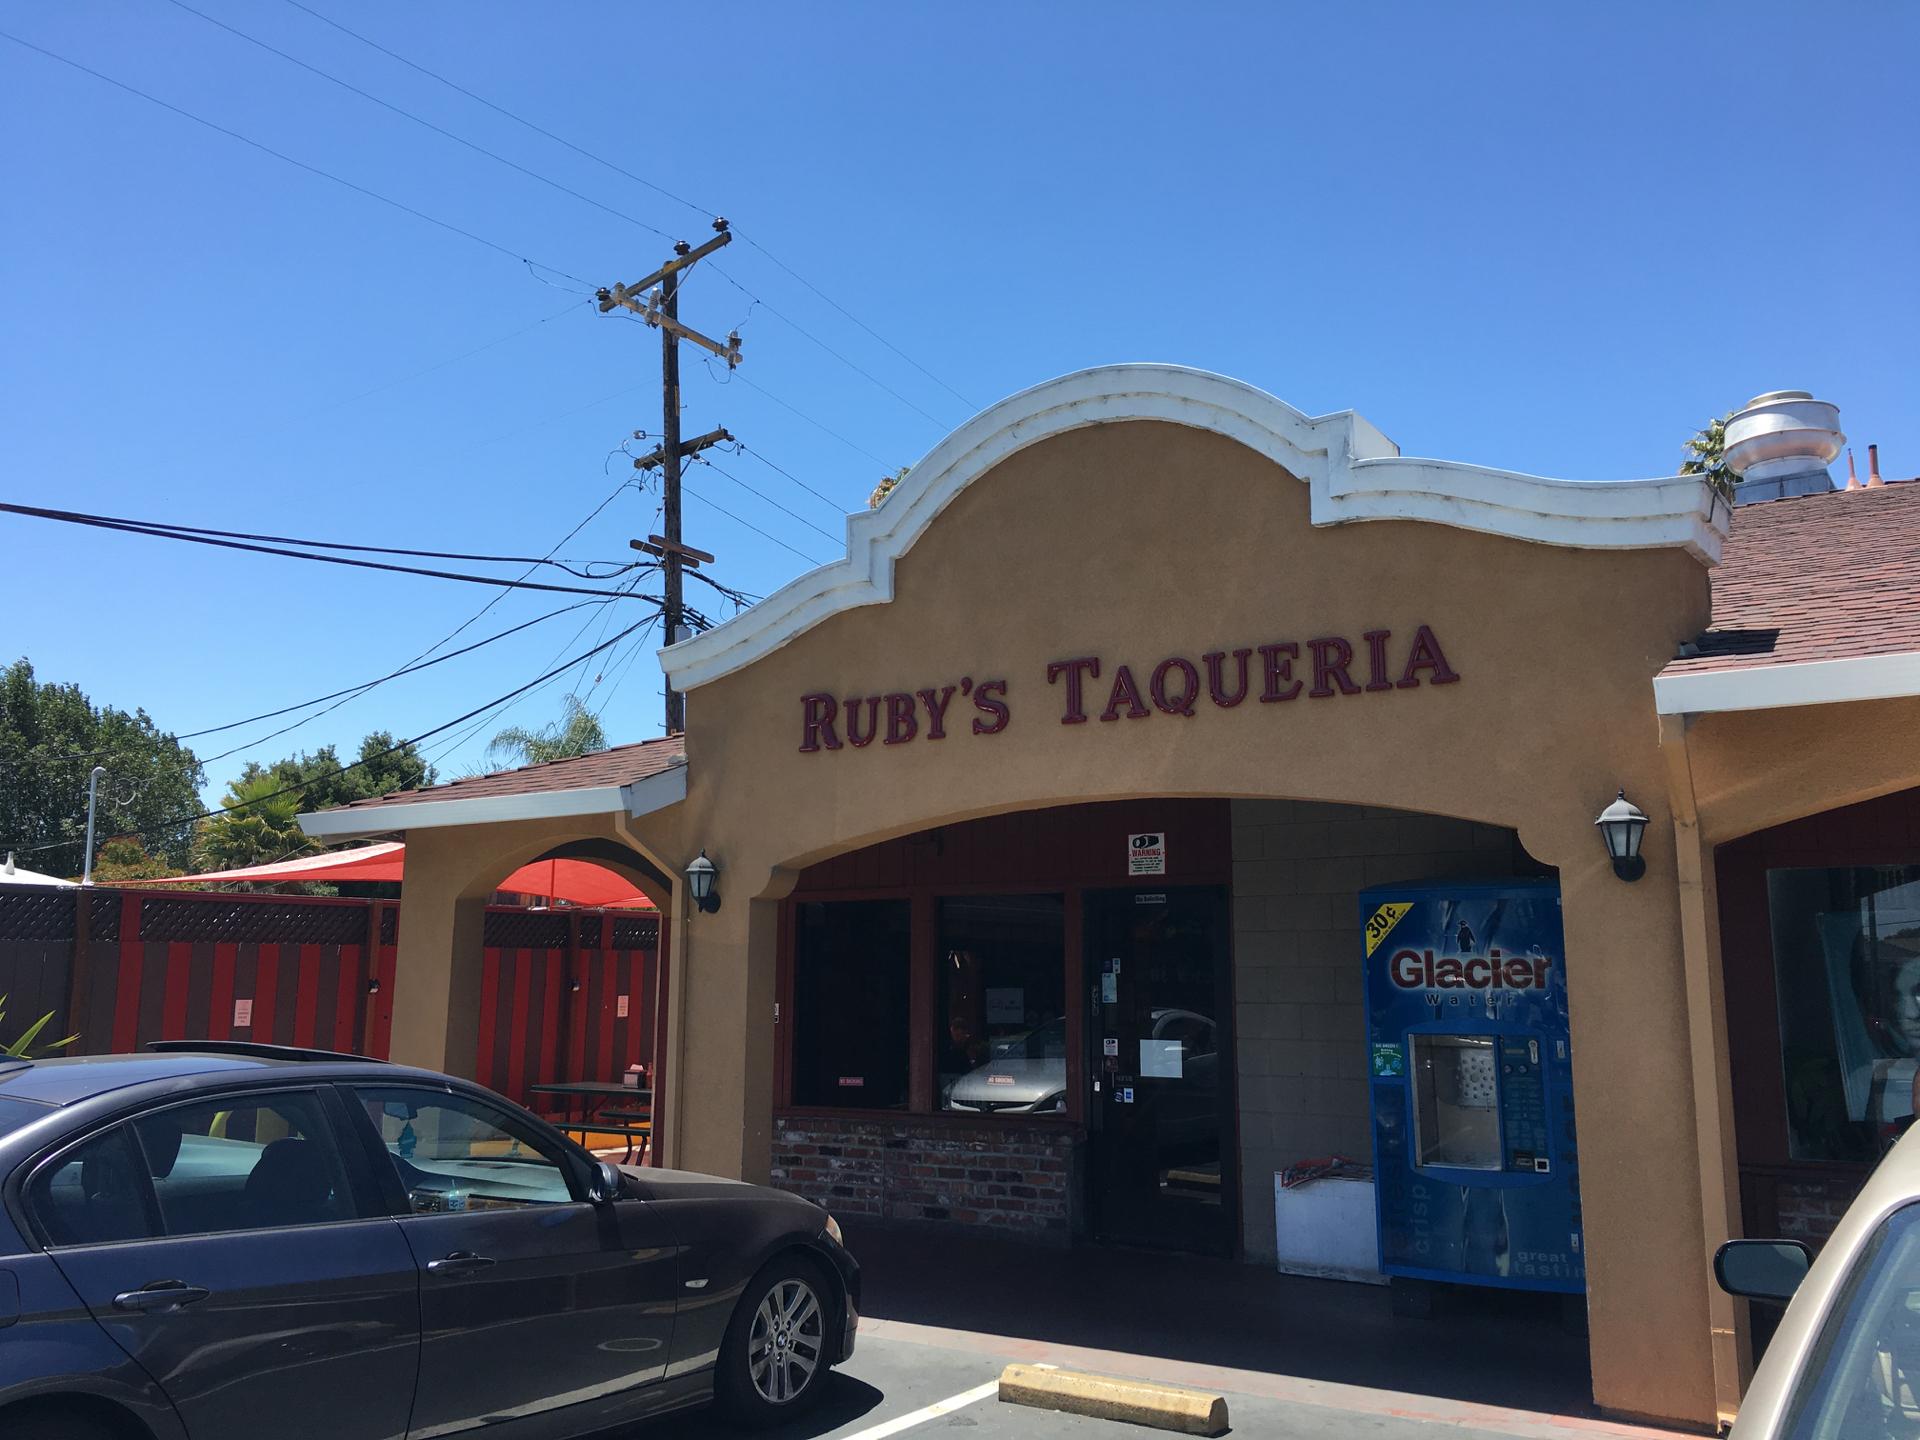 Outside Ruby's Taqueria in Sunnyvale.